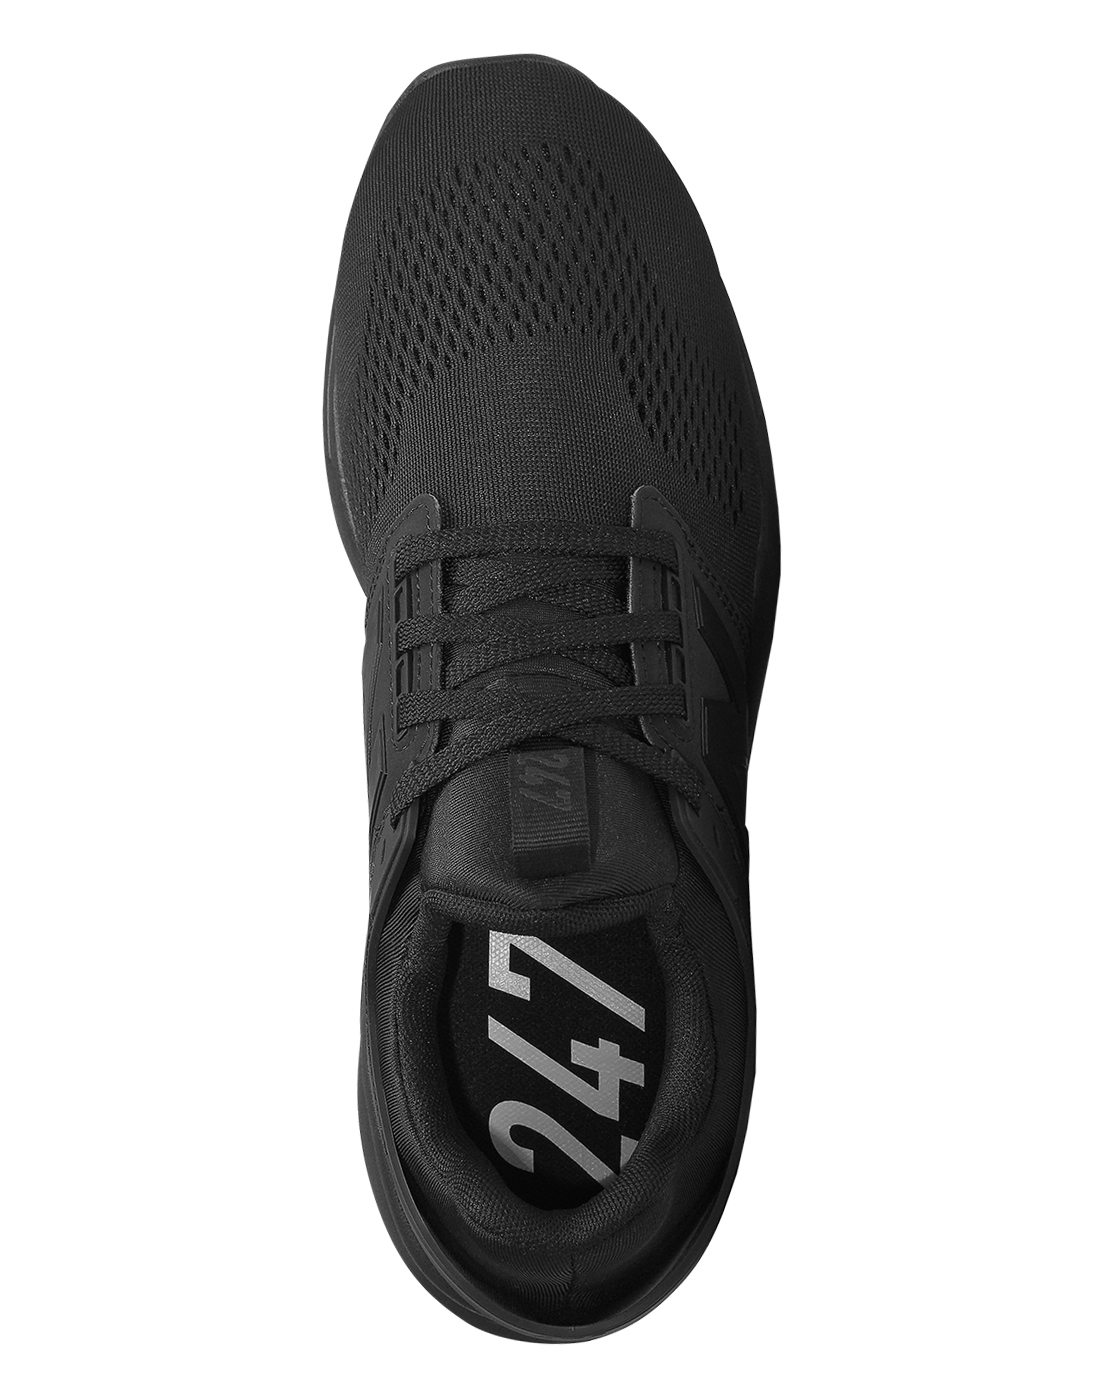 Men's New Balance 247 V2 | Black | Life Style Sports